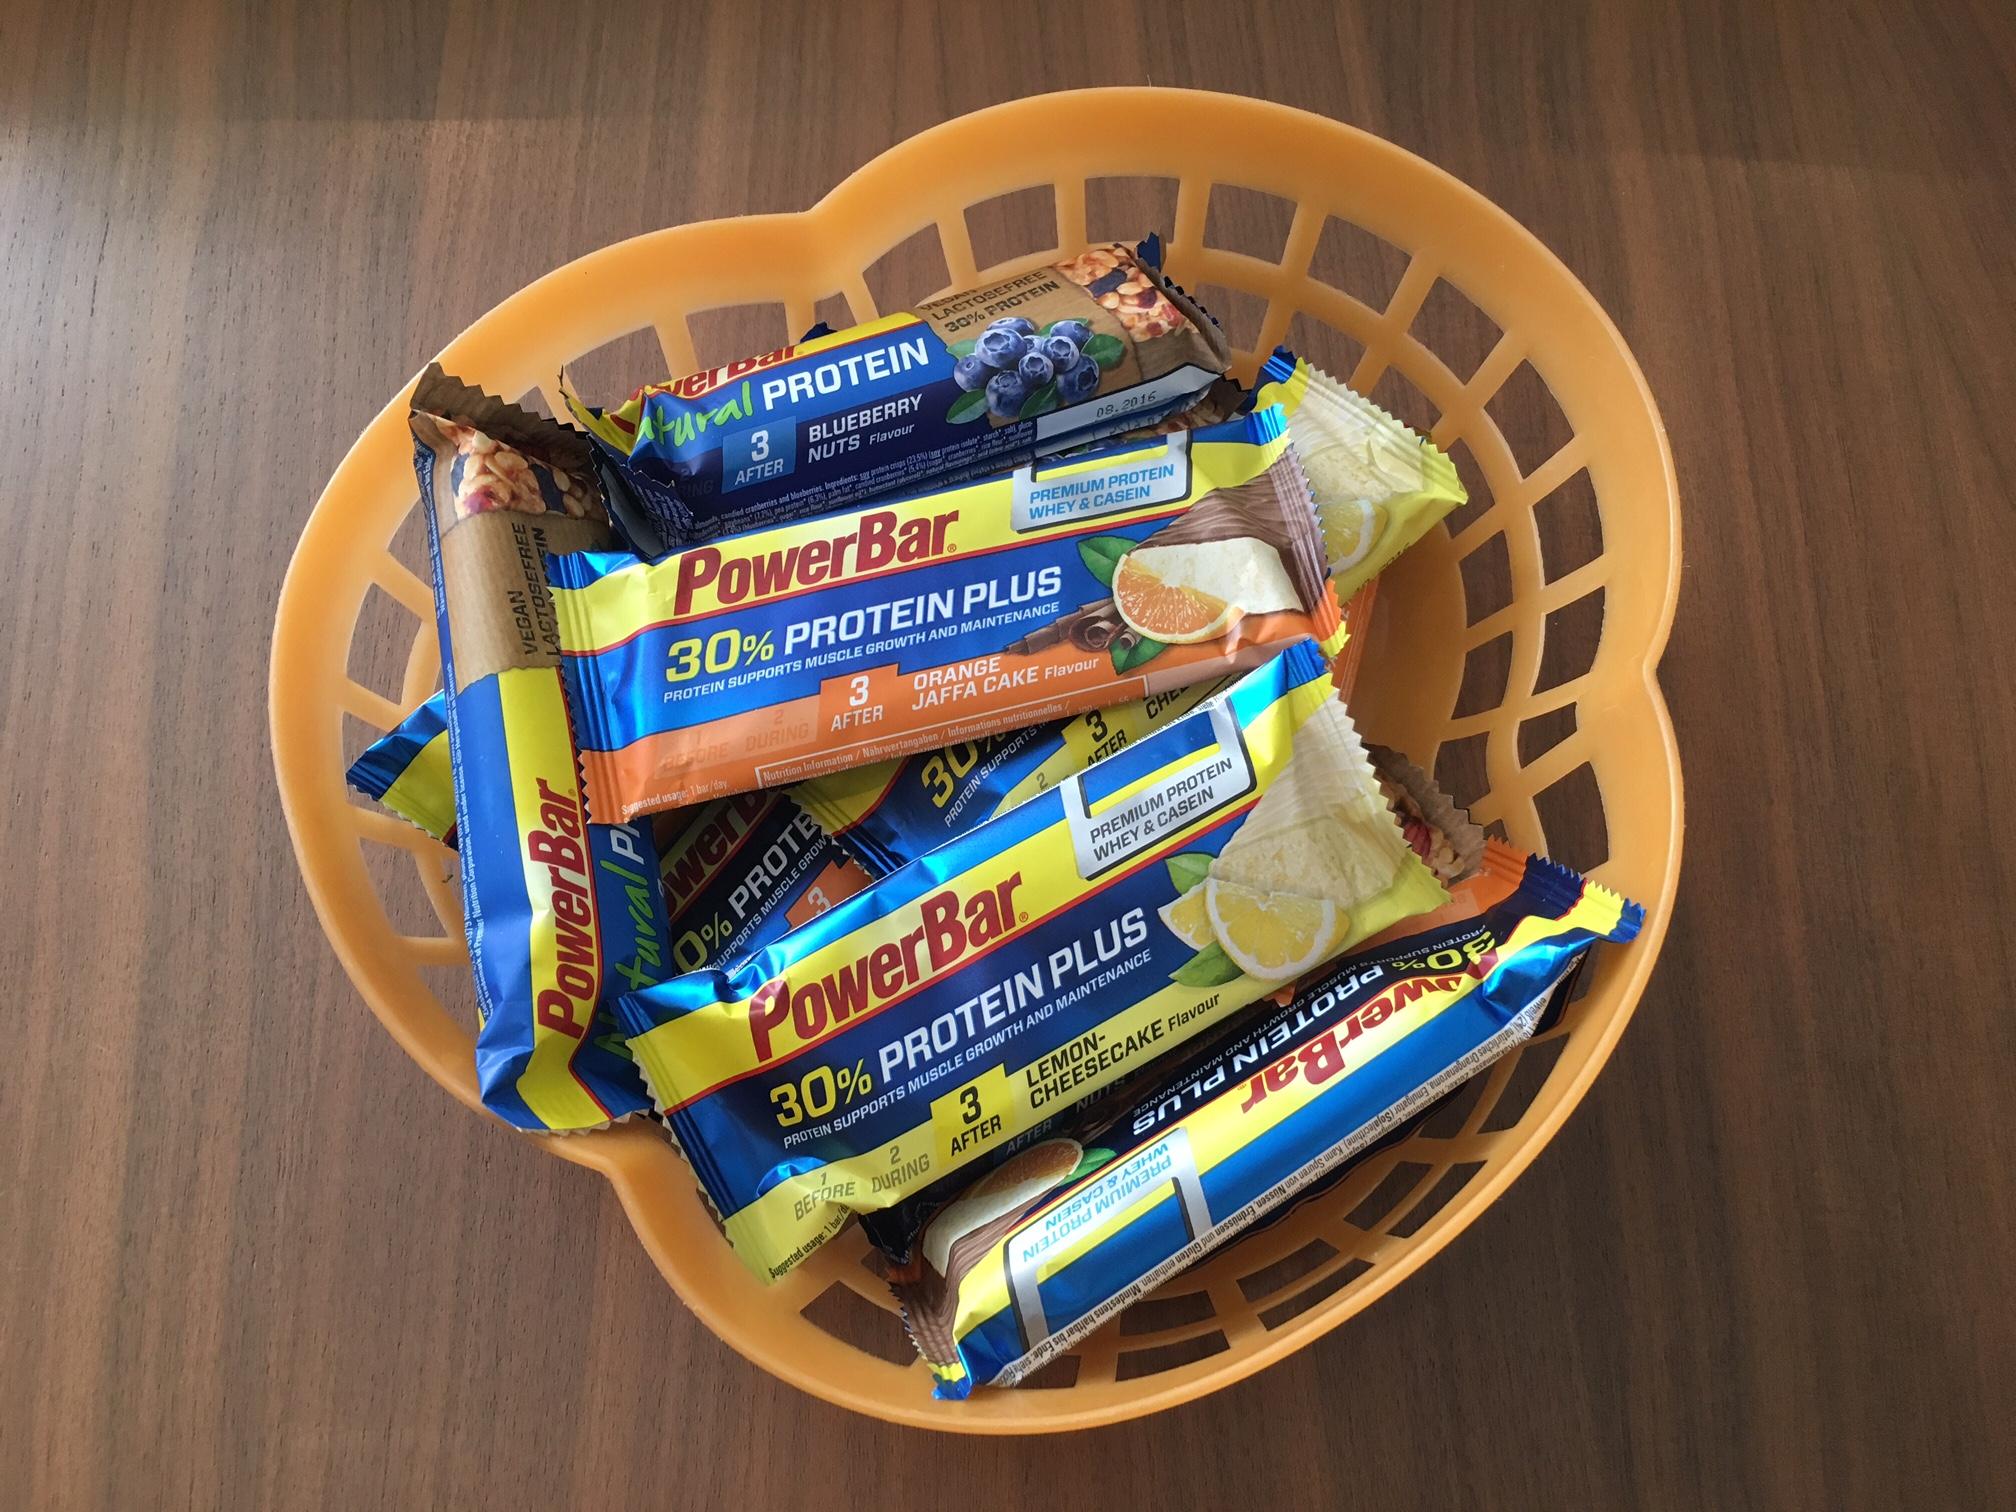 Tasty new offerings from PowerBar